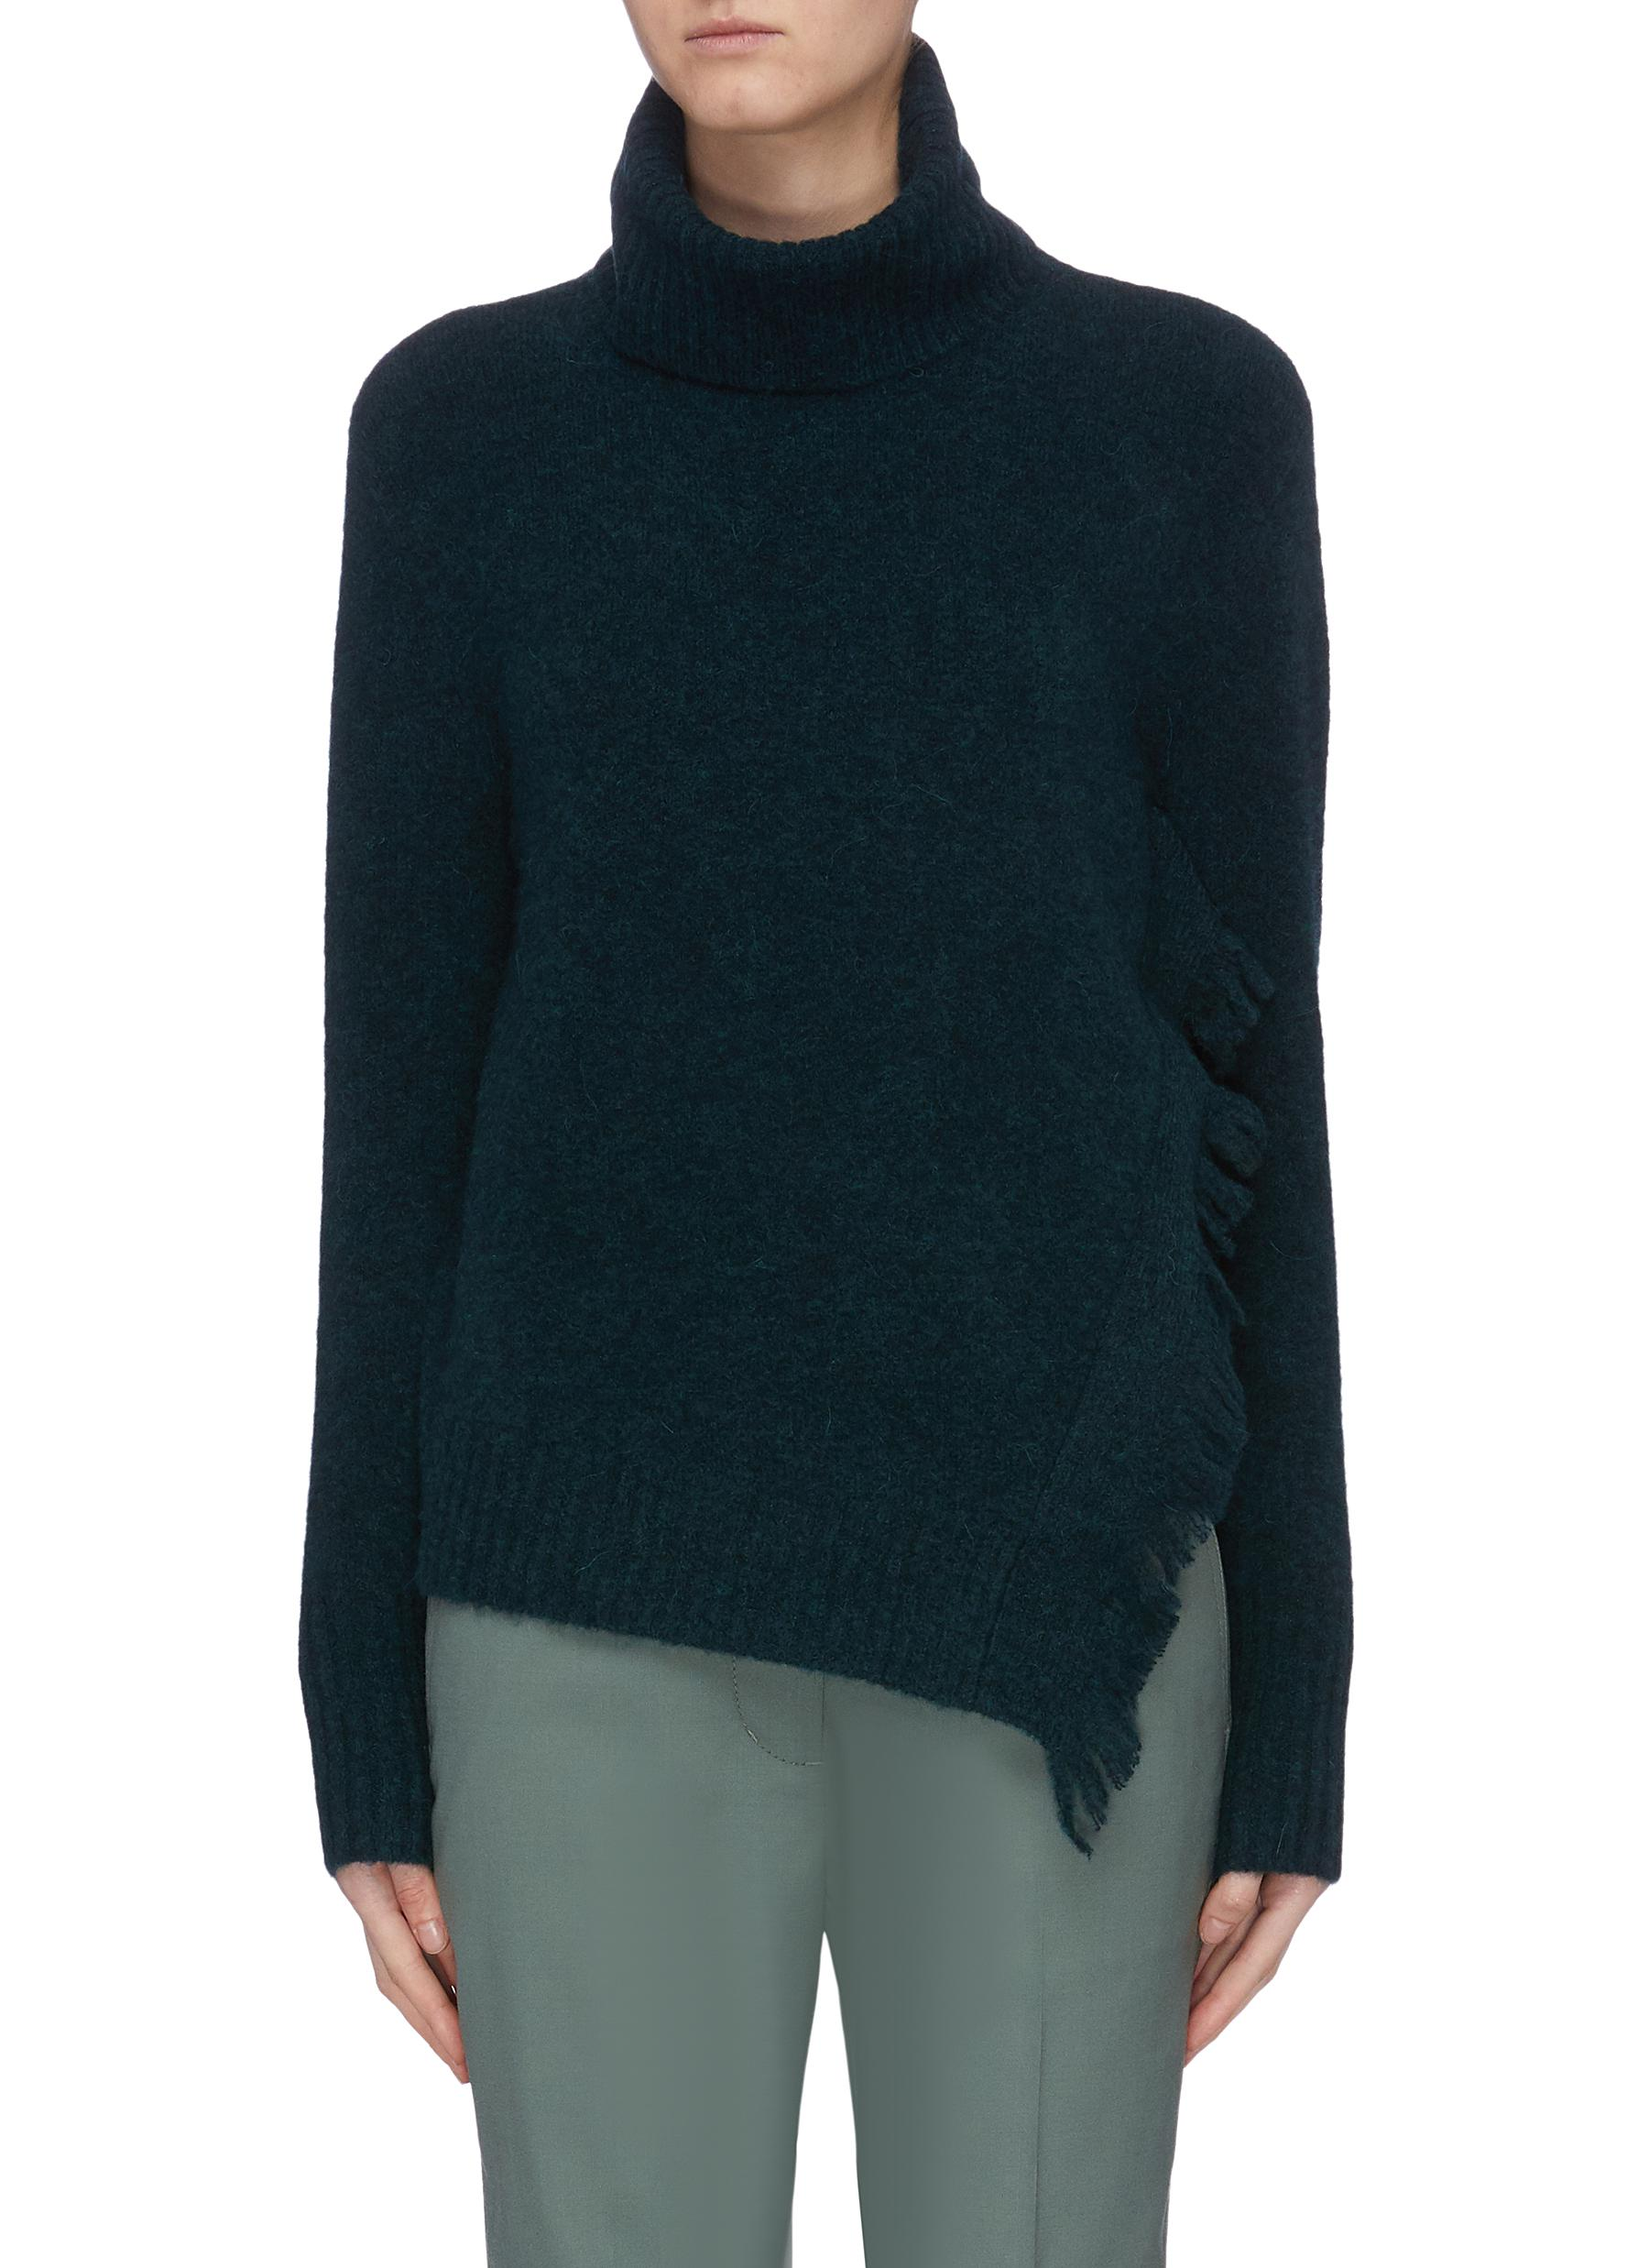 Fringe drape side turtleneck sweater by 3.1 Phillip Lim